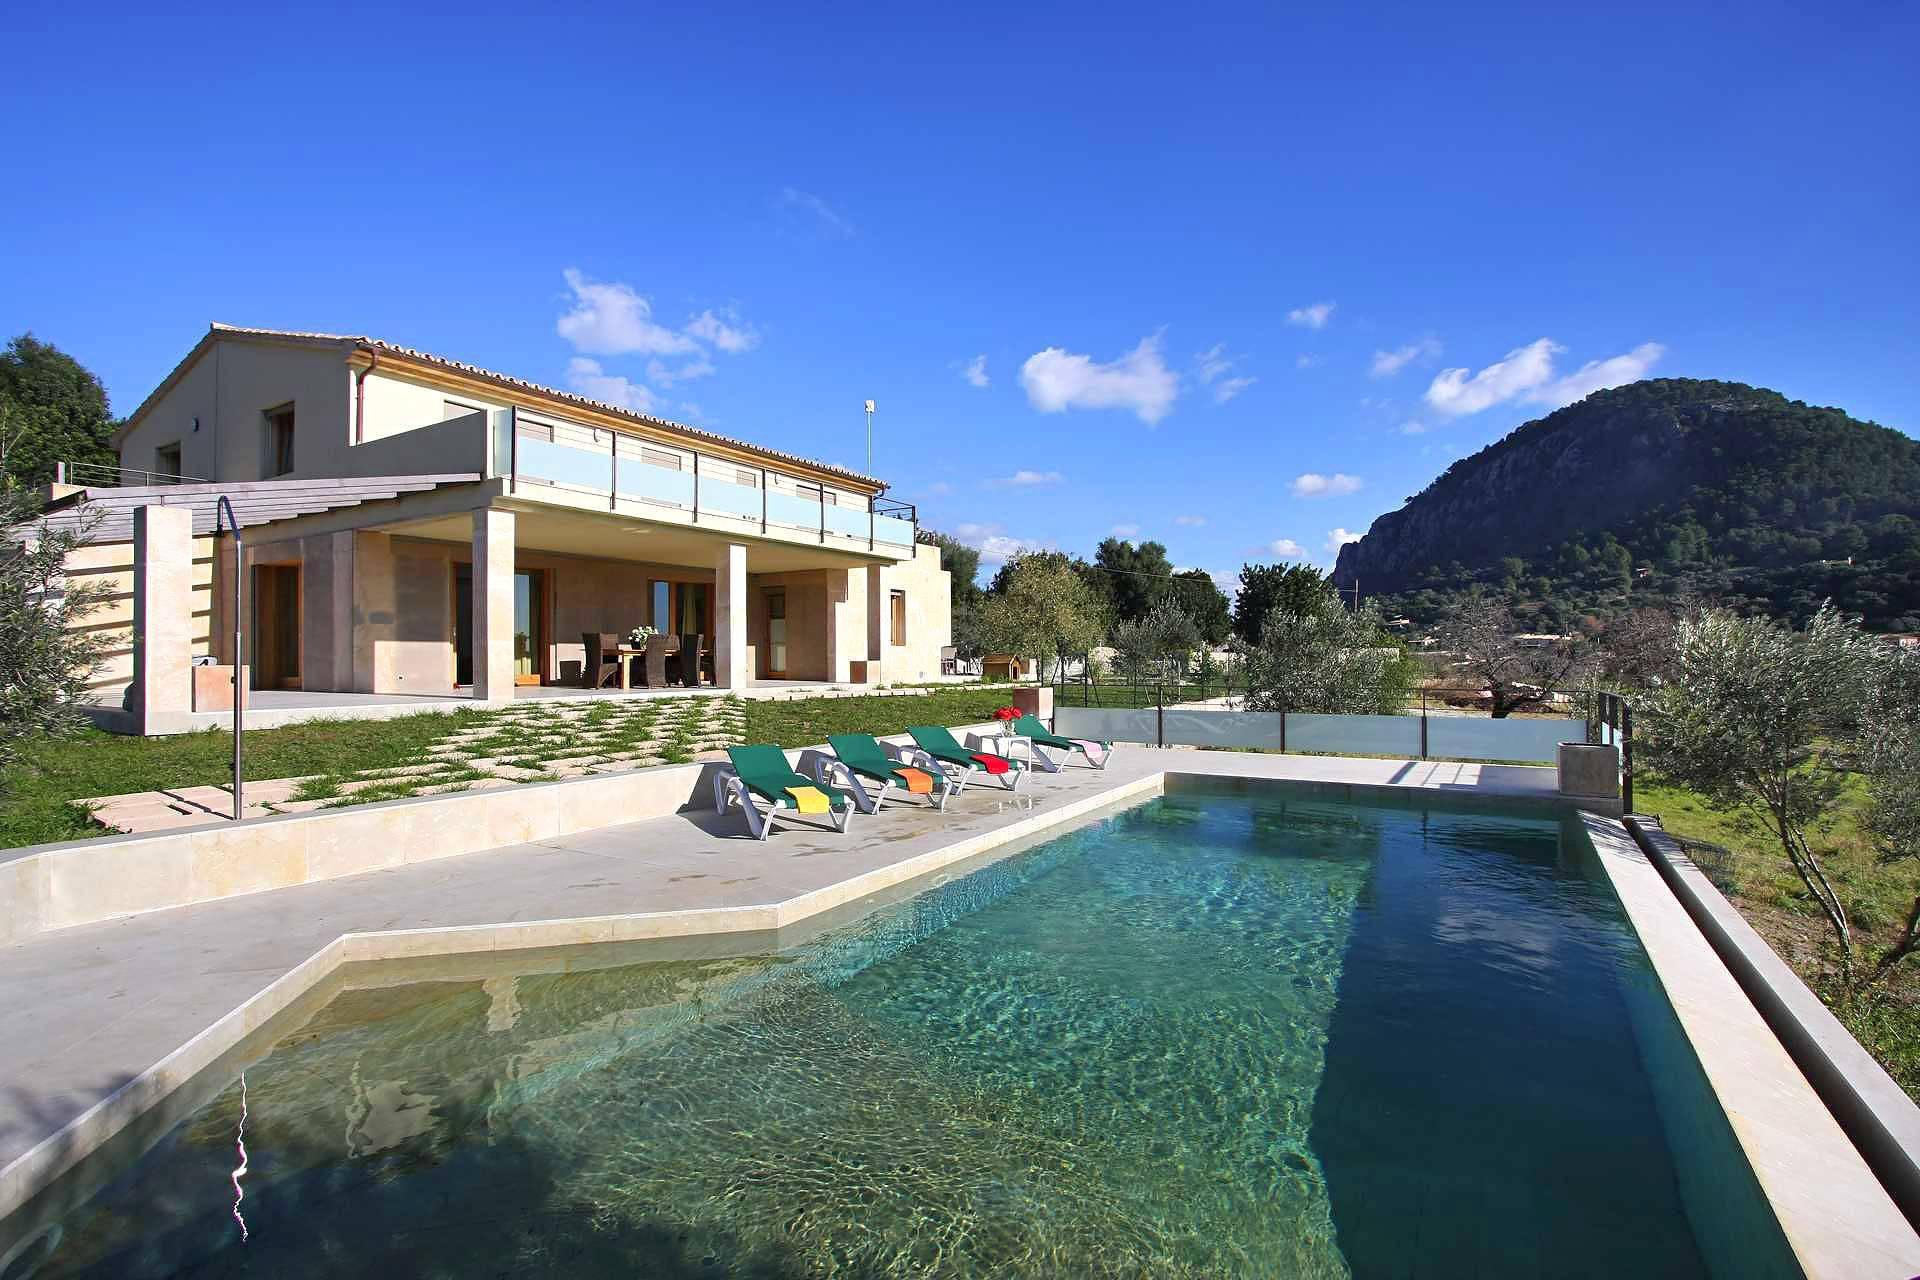 01-36 klassische Villa Mallorca Norden Bild 3